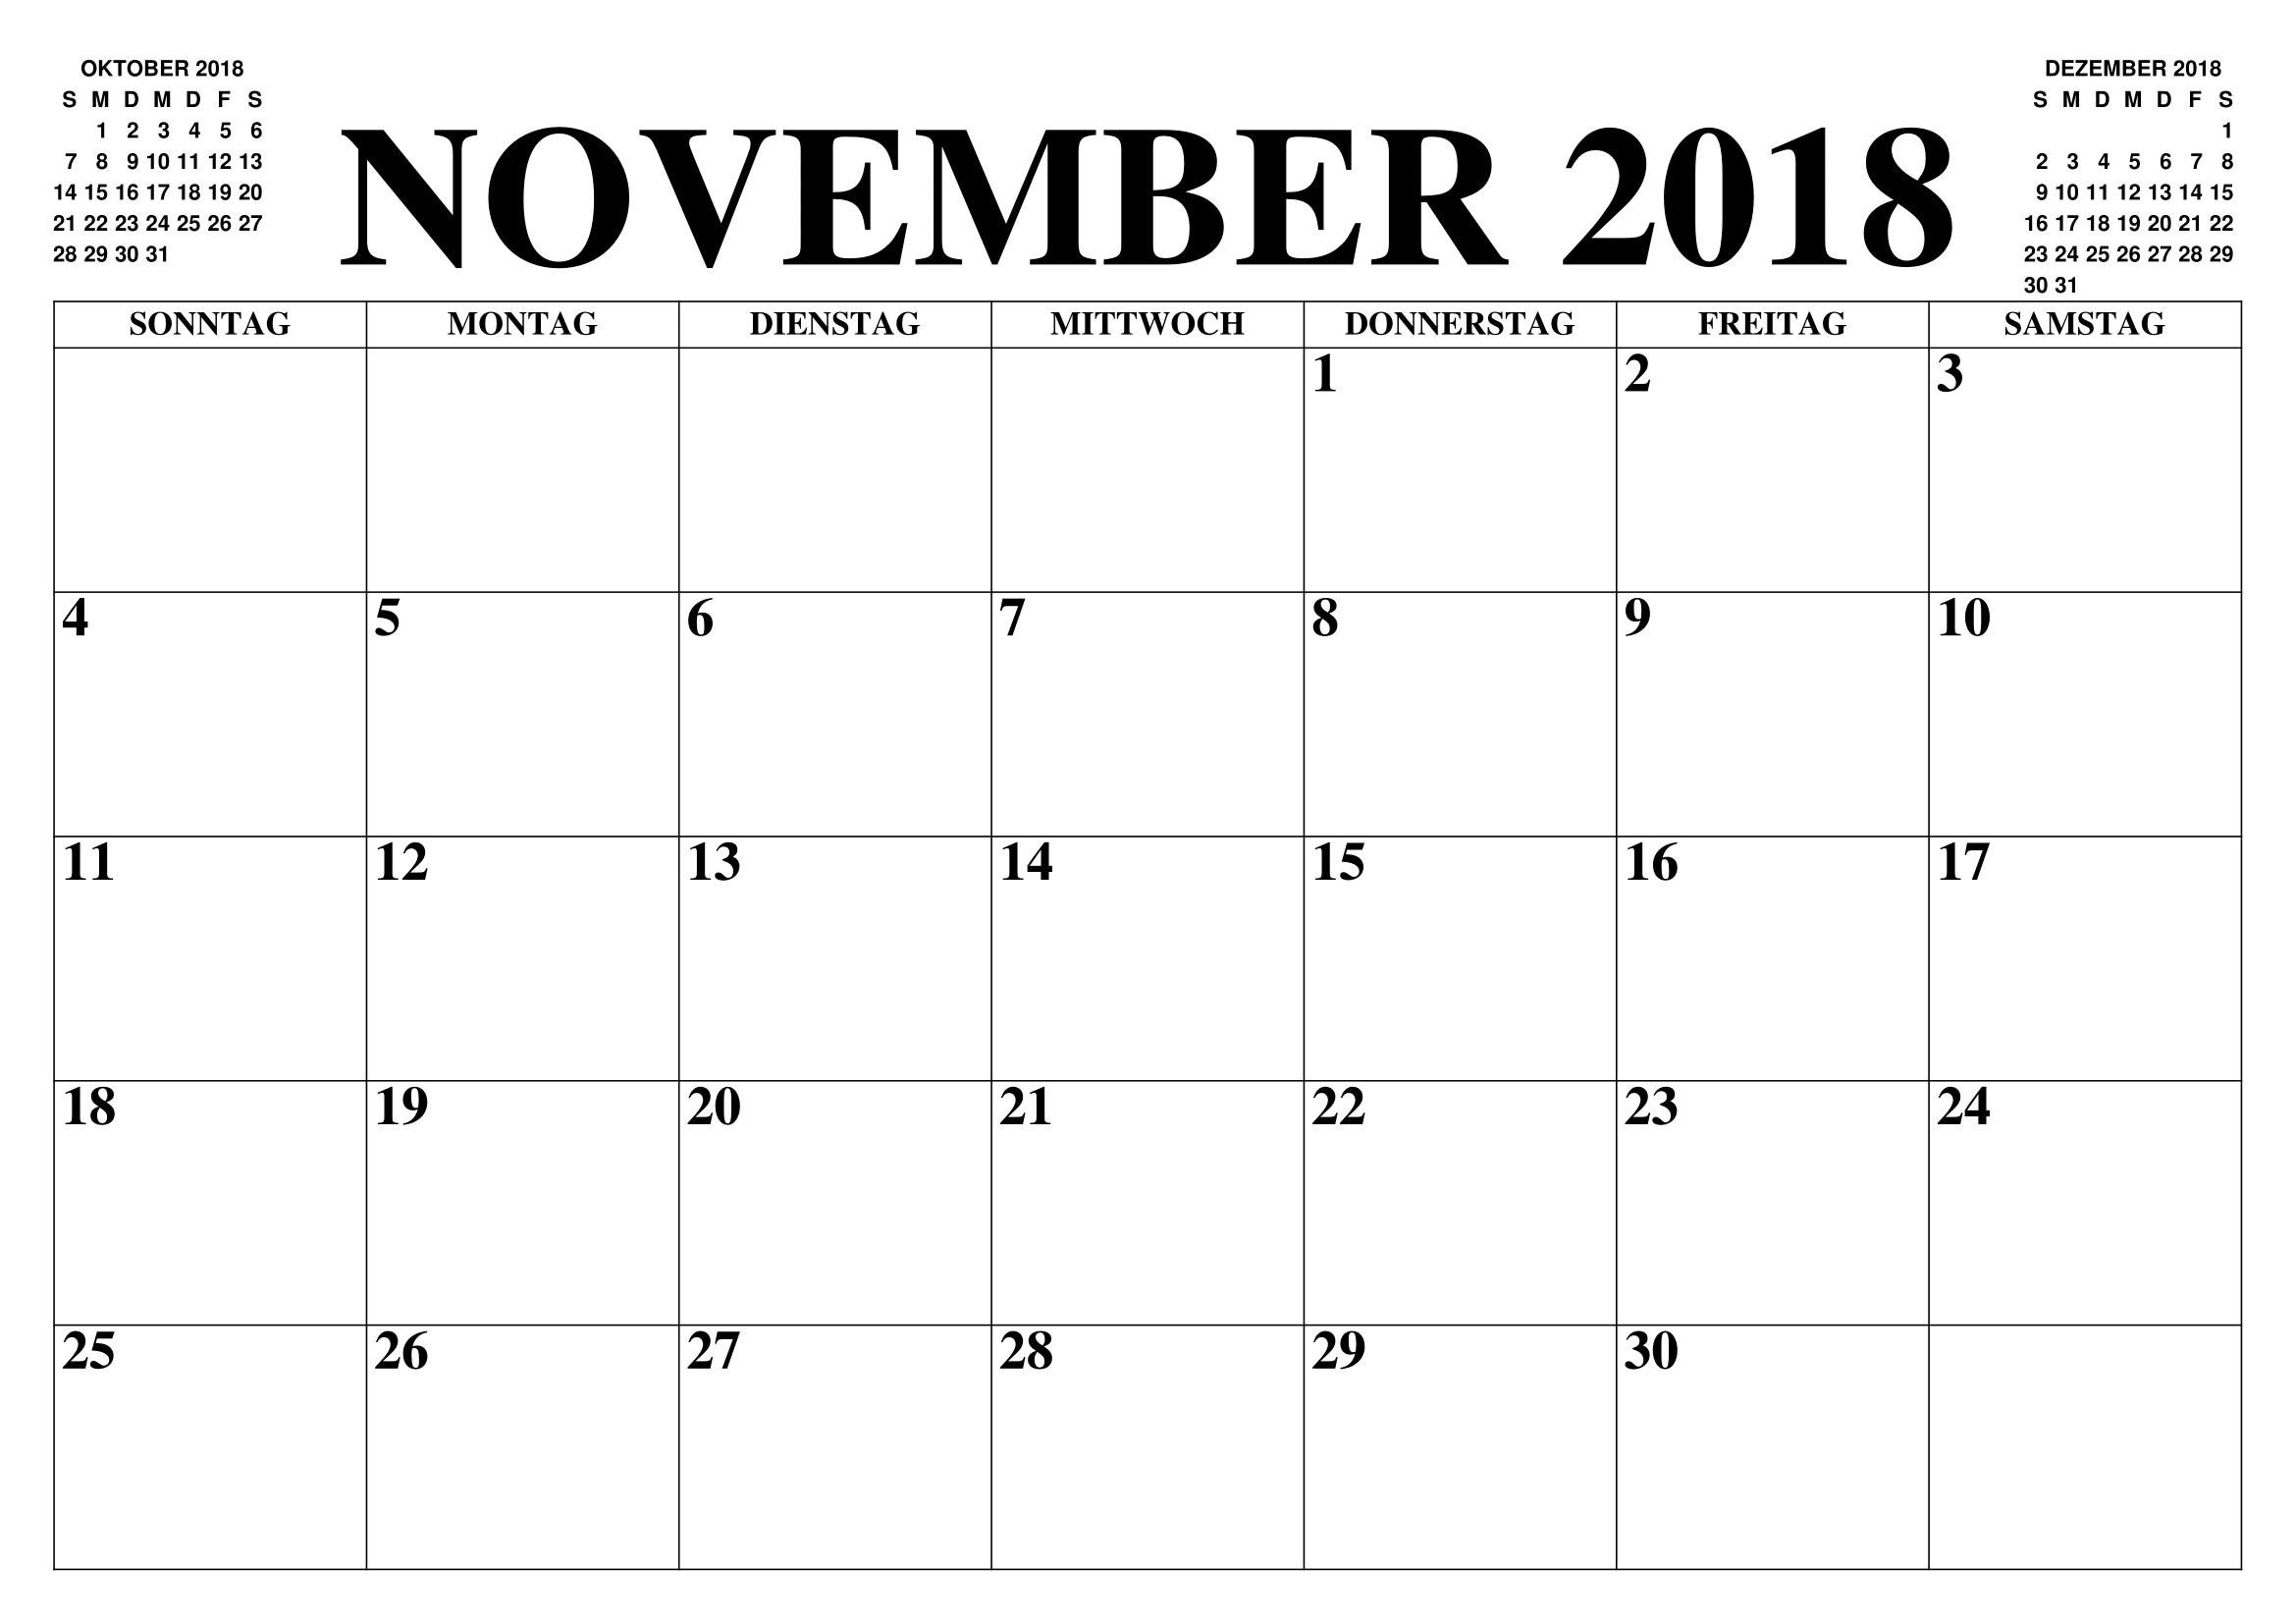 Calendario 2019 Excel Descargar Más Reciente Kalender Ausdrucken Von Bis